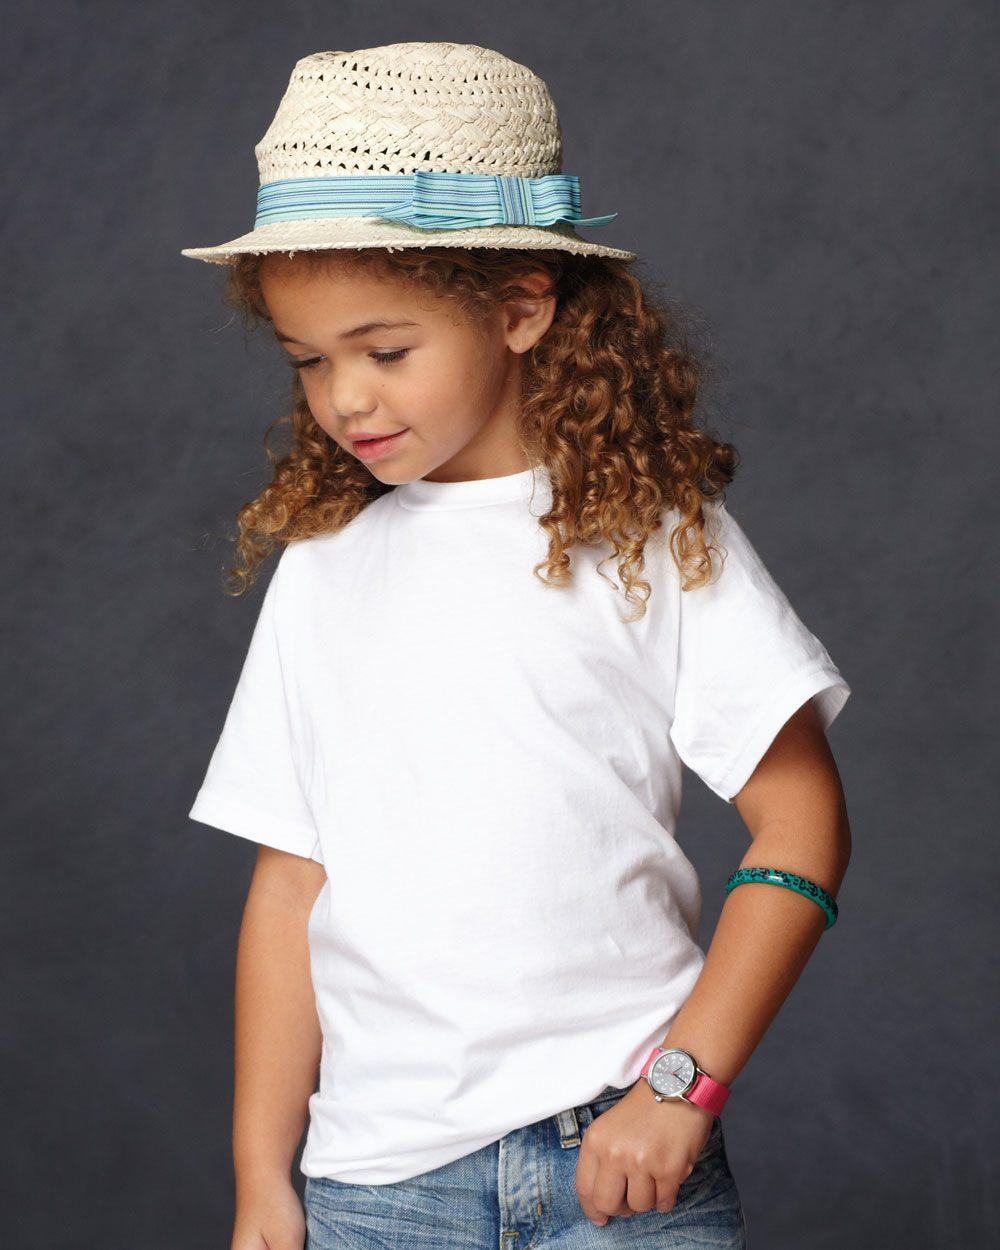 Label Free Kids T-shirt-G S Mahal & Co  Ltd